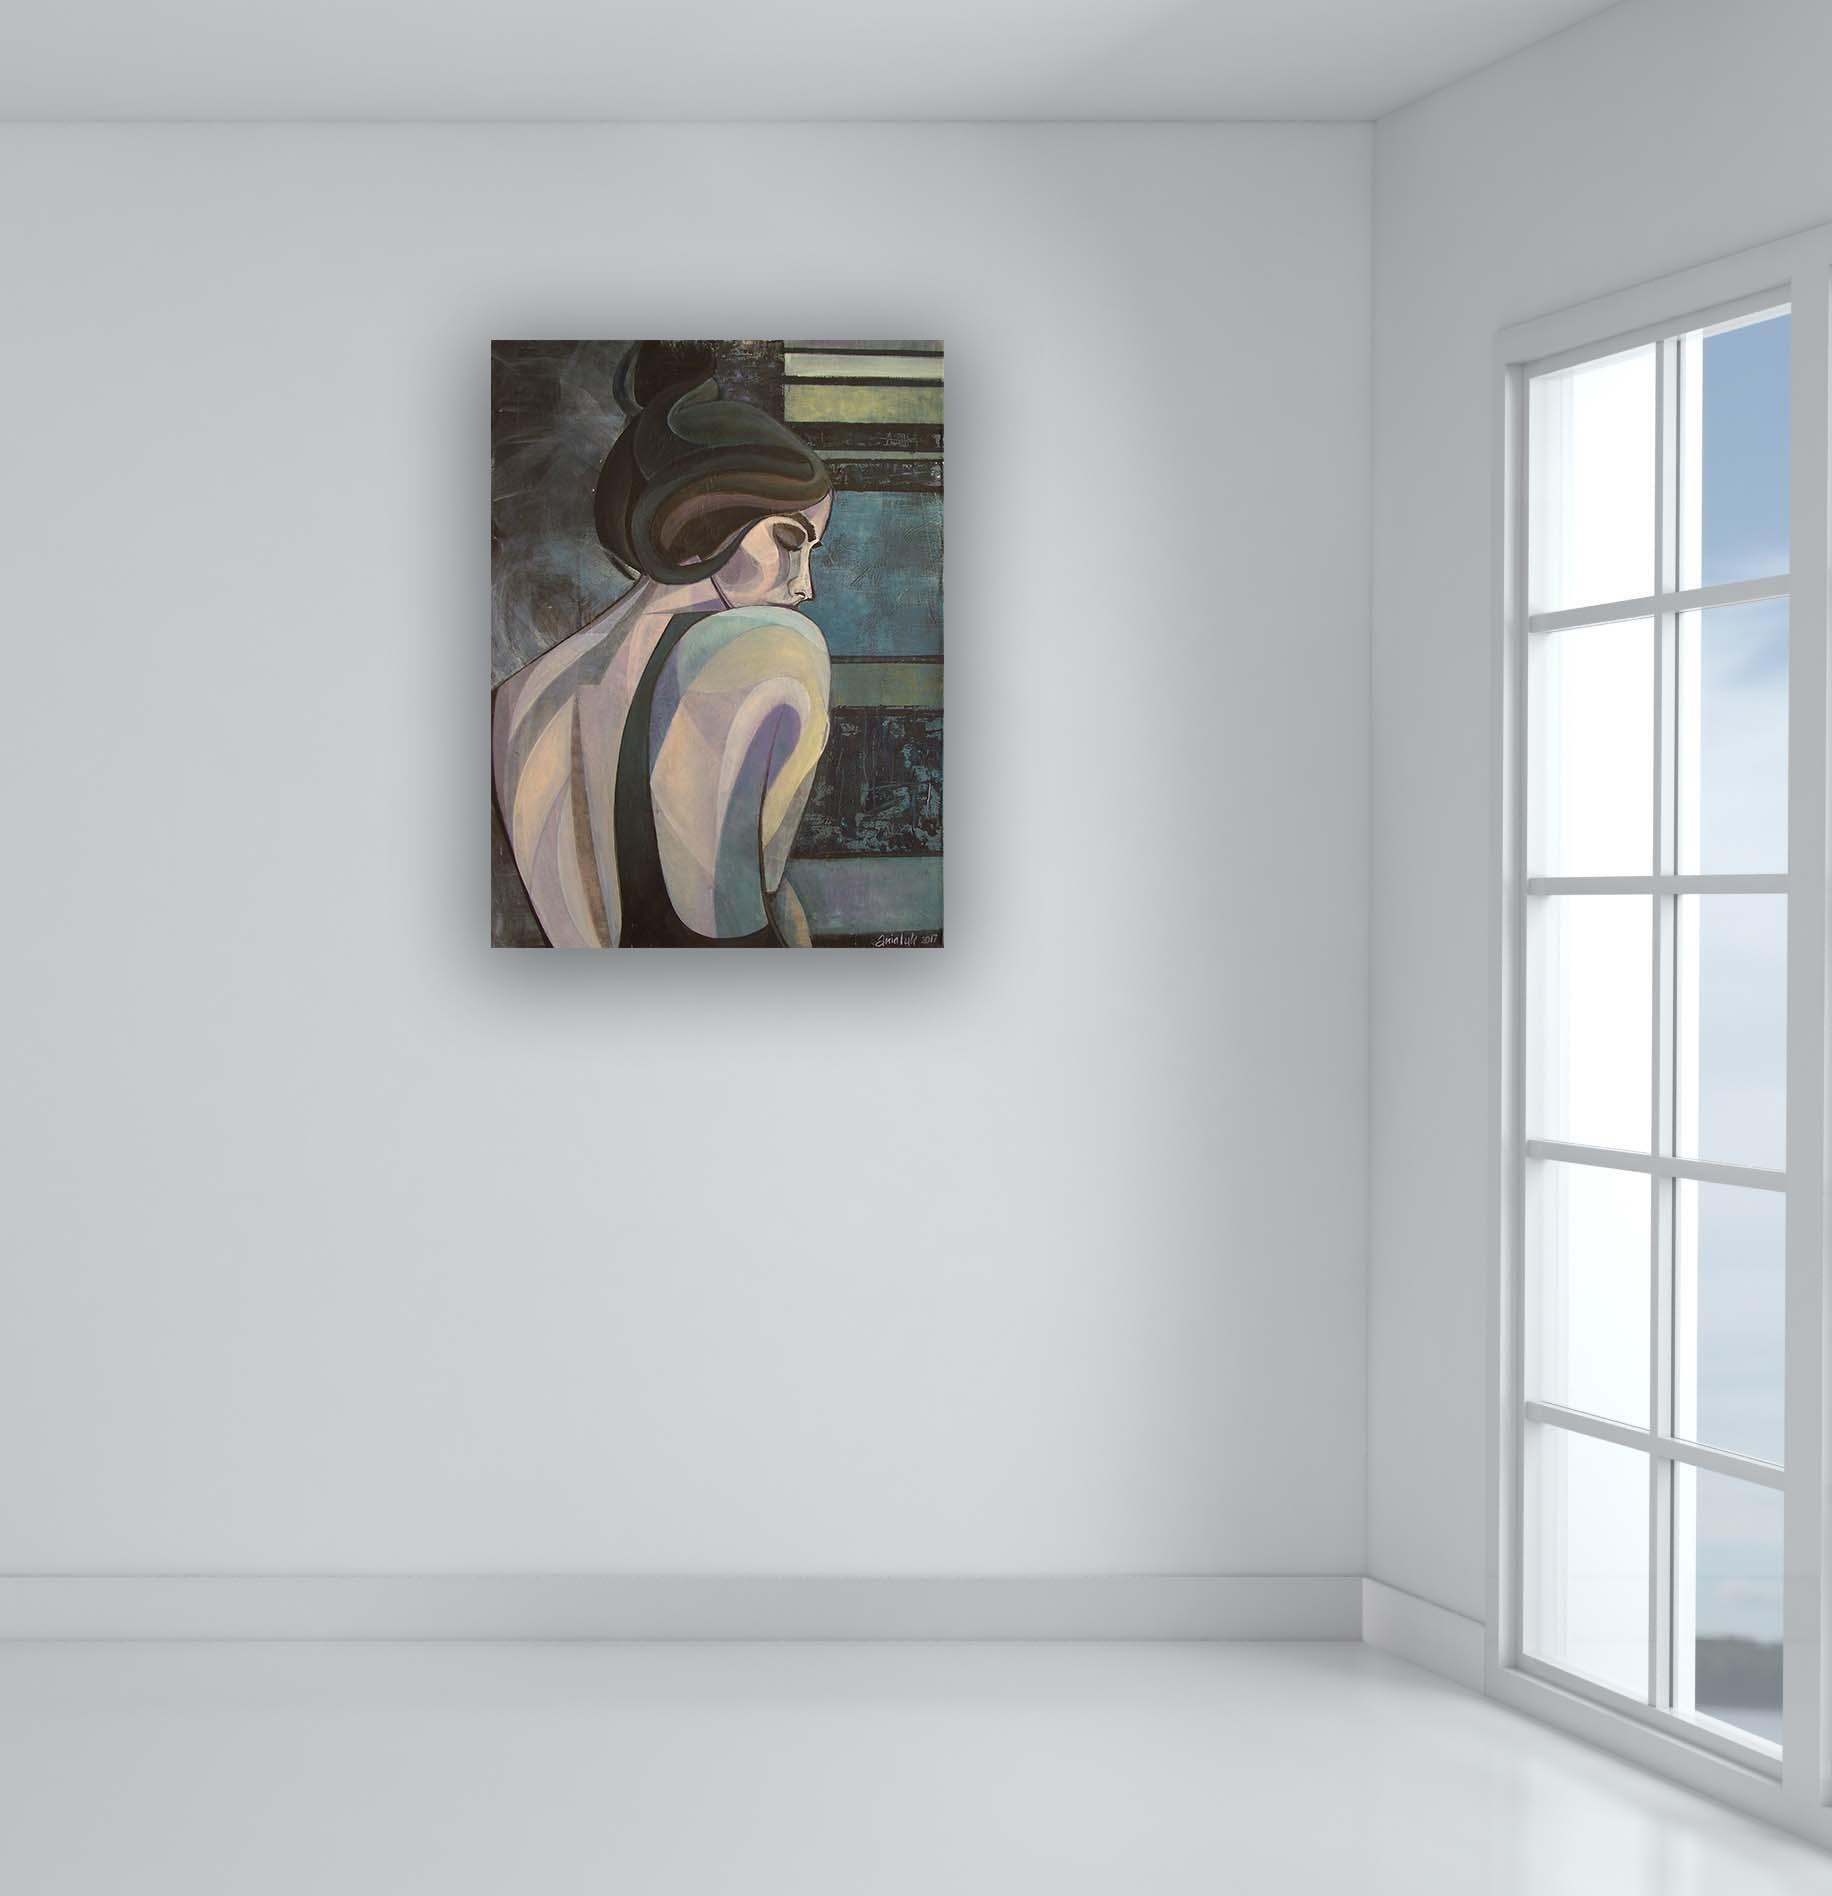 Sensual 2 Painting Of Beautiful Woman Inspiredart Deco With Sensual Wall Art (View 16 of 20)